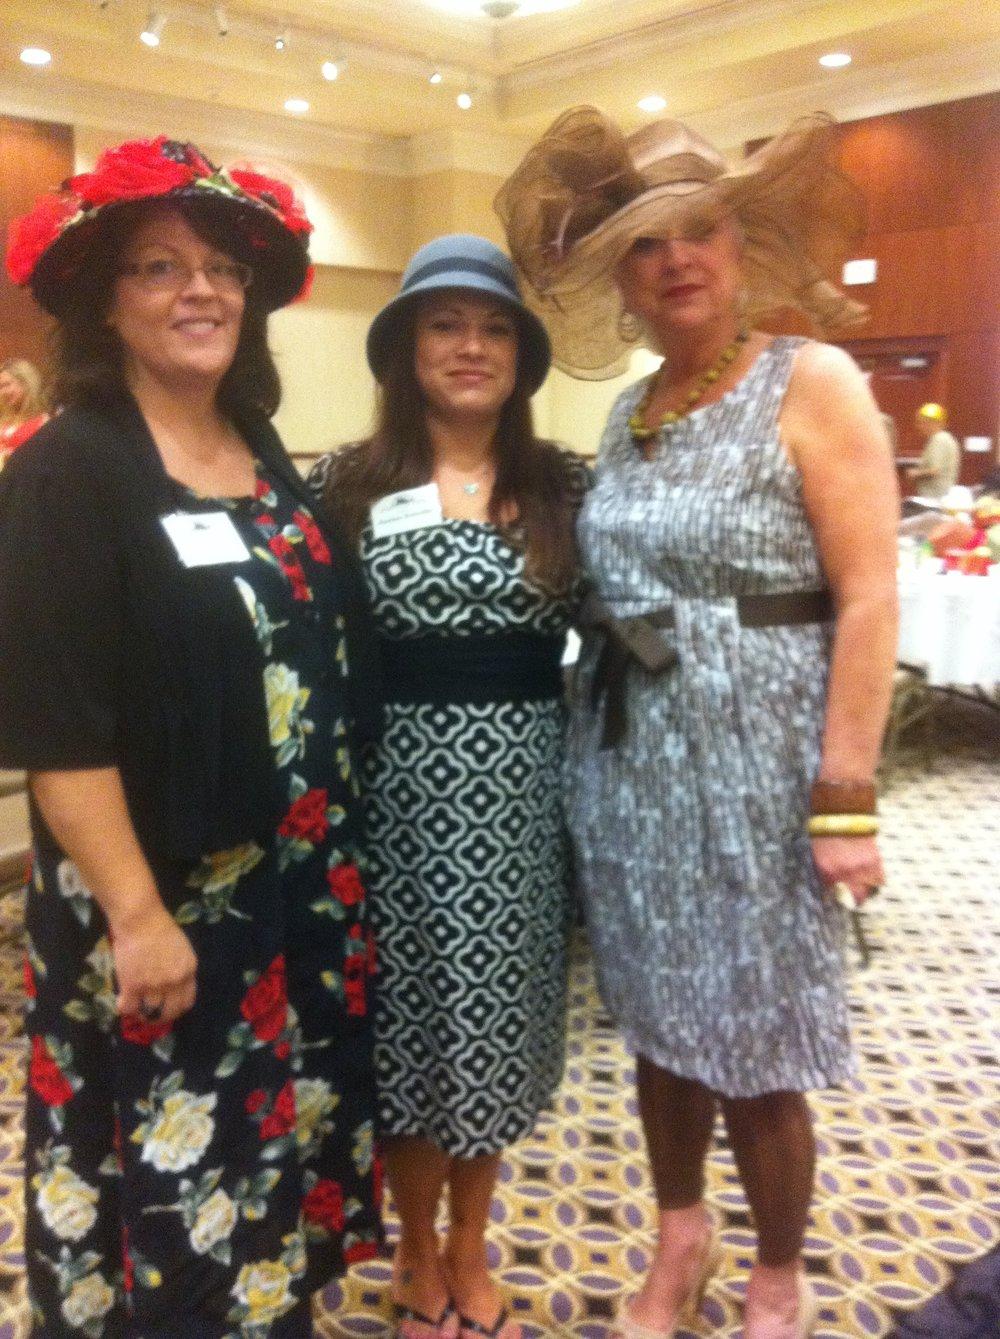 2012 Terri Barnes, Janine Estrella & Dottie Lou Norwood